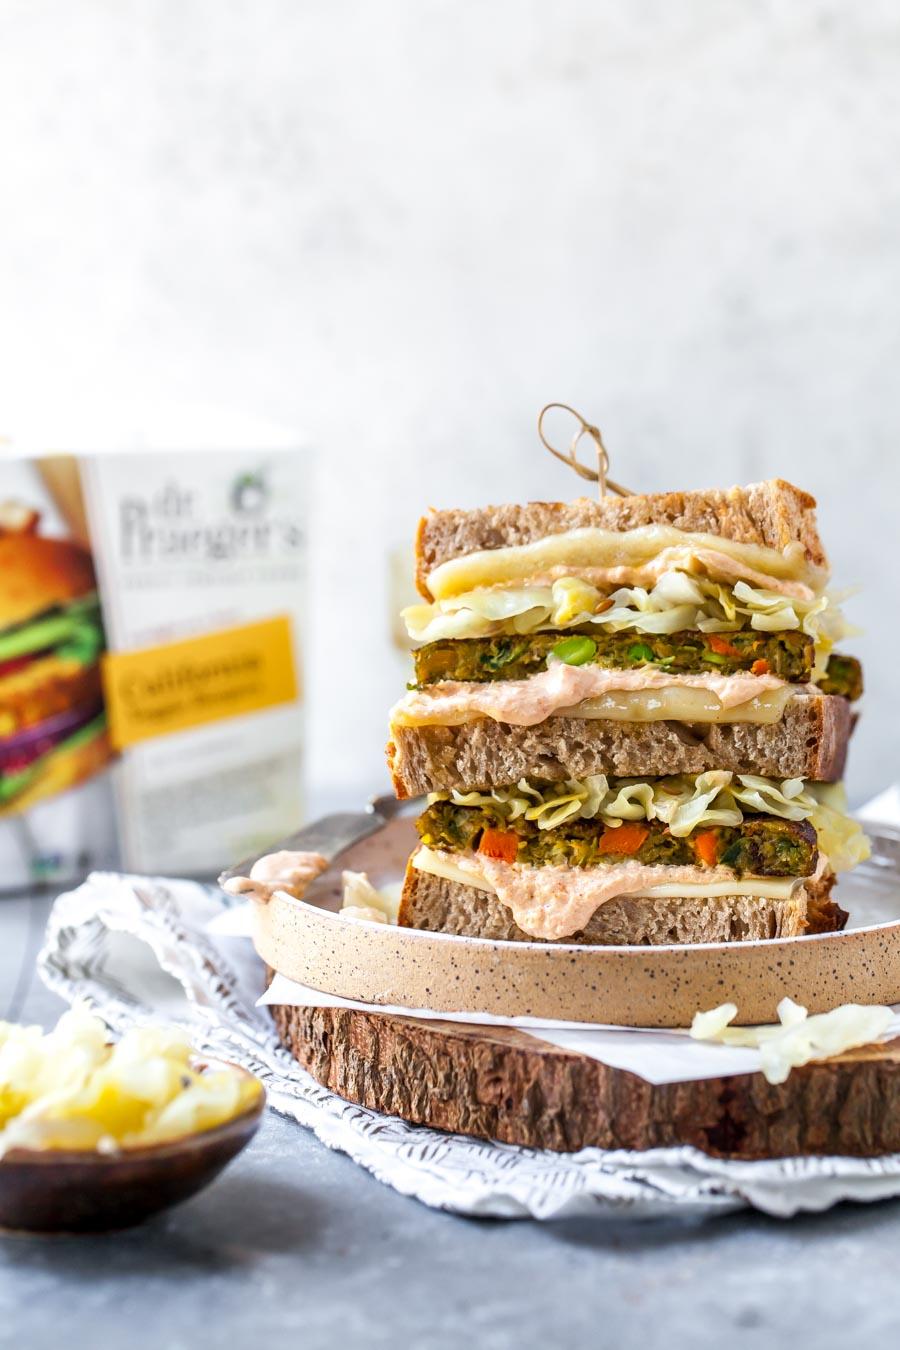 Plant-Based Reuben Sandwich